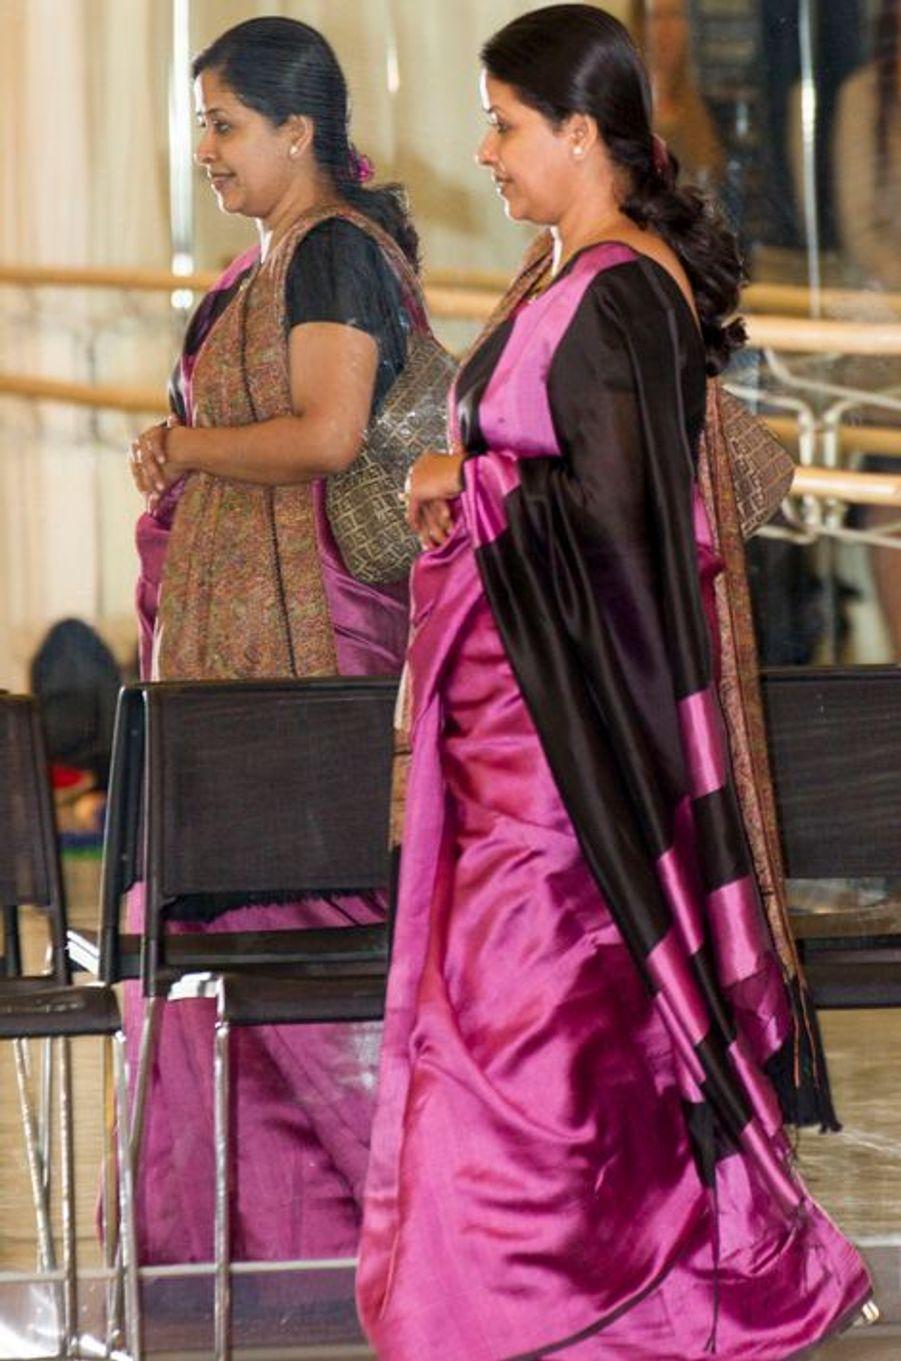 Sharmistha Mukherjee à Oslo le 14 octobre 2014